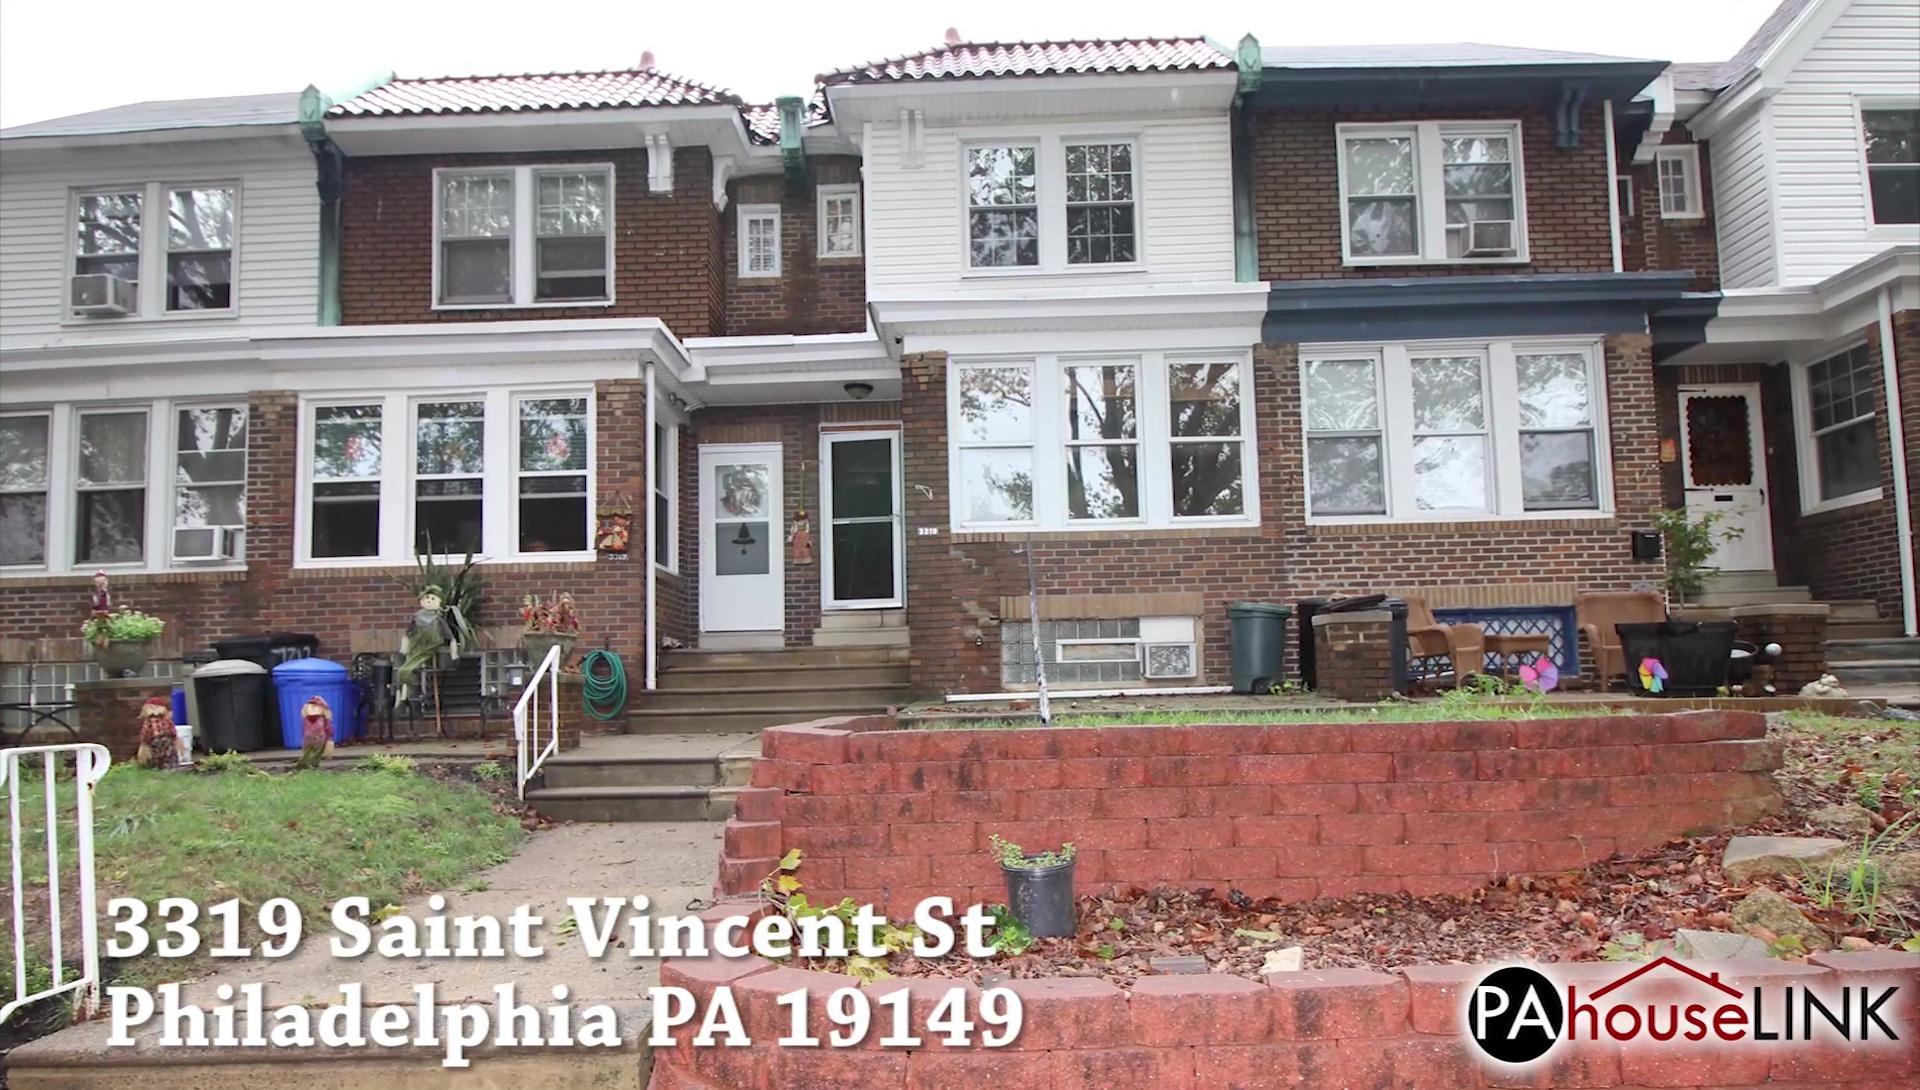 3319 Saint Vincent St Philadelphia PA 19149 | Coming Soon Foreclosure Properties Philadelphia PA 19149